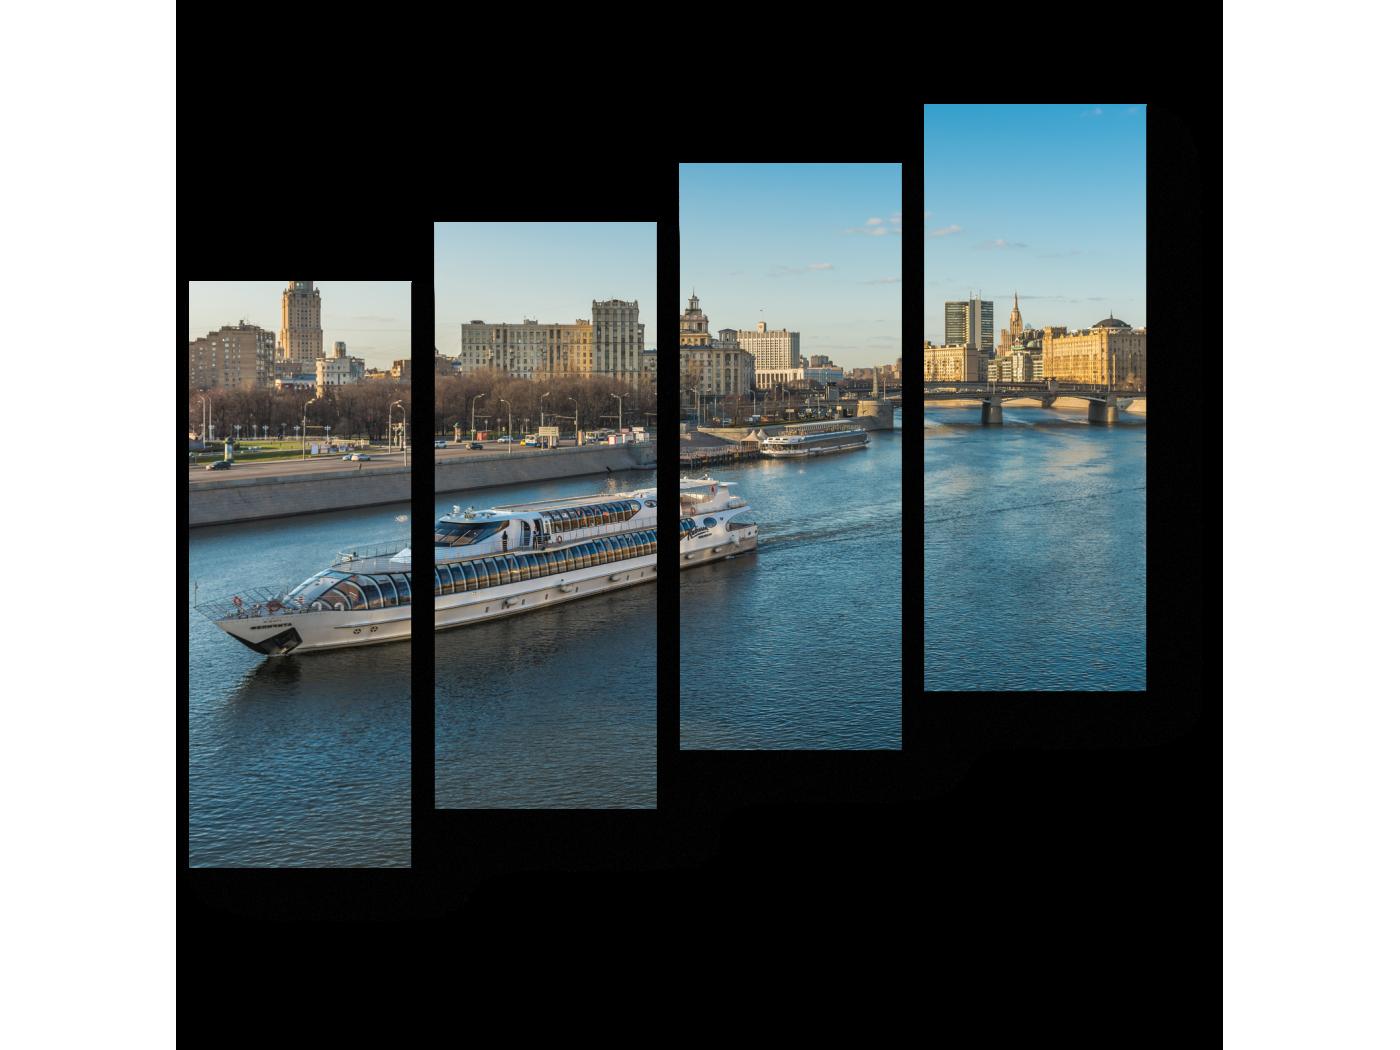 Модульная картина Путешествие по Москва реке (80x69) фото